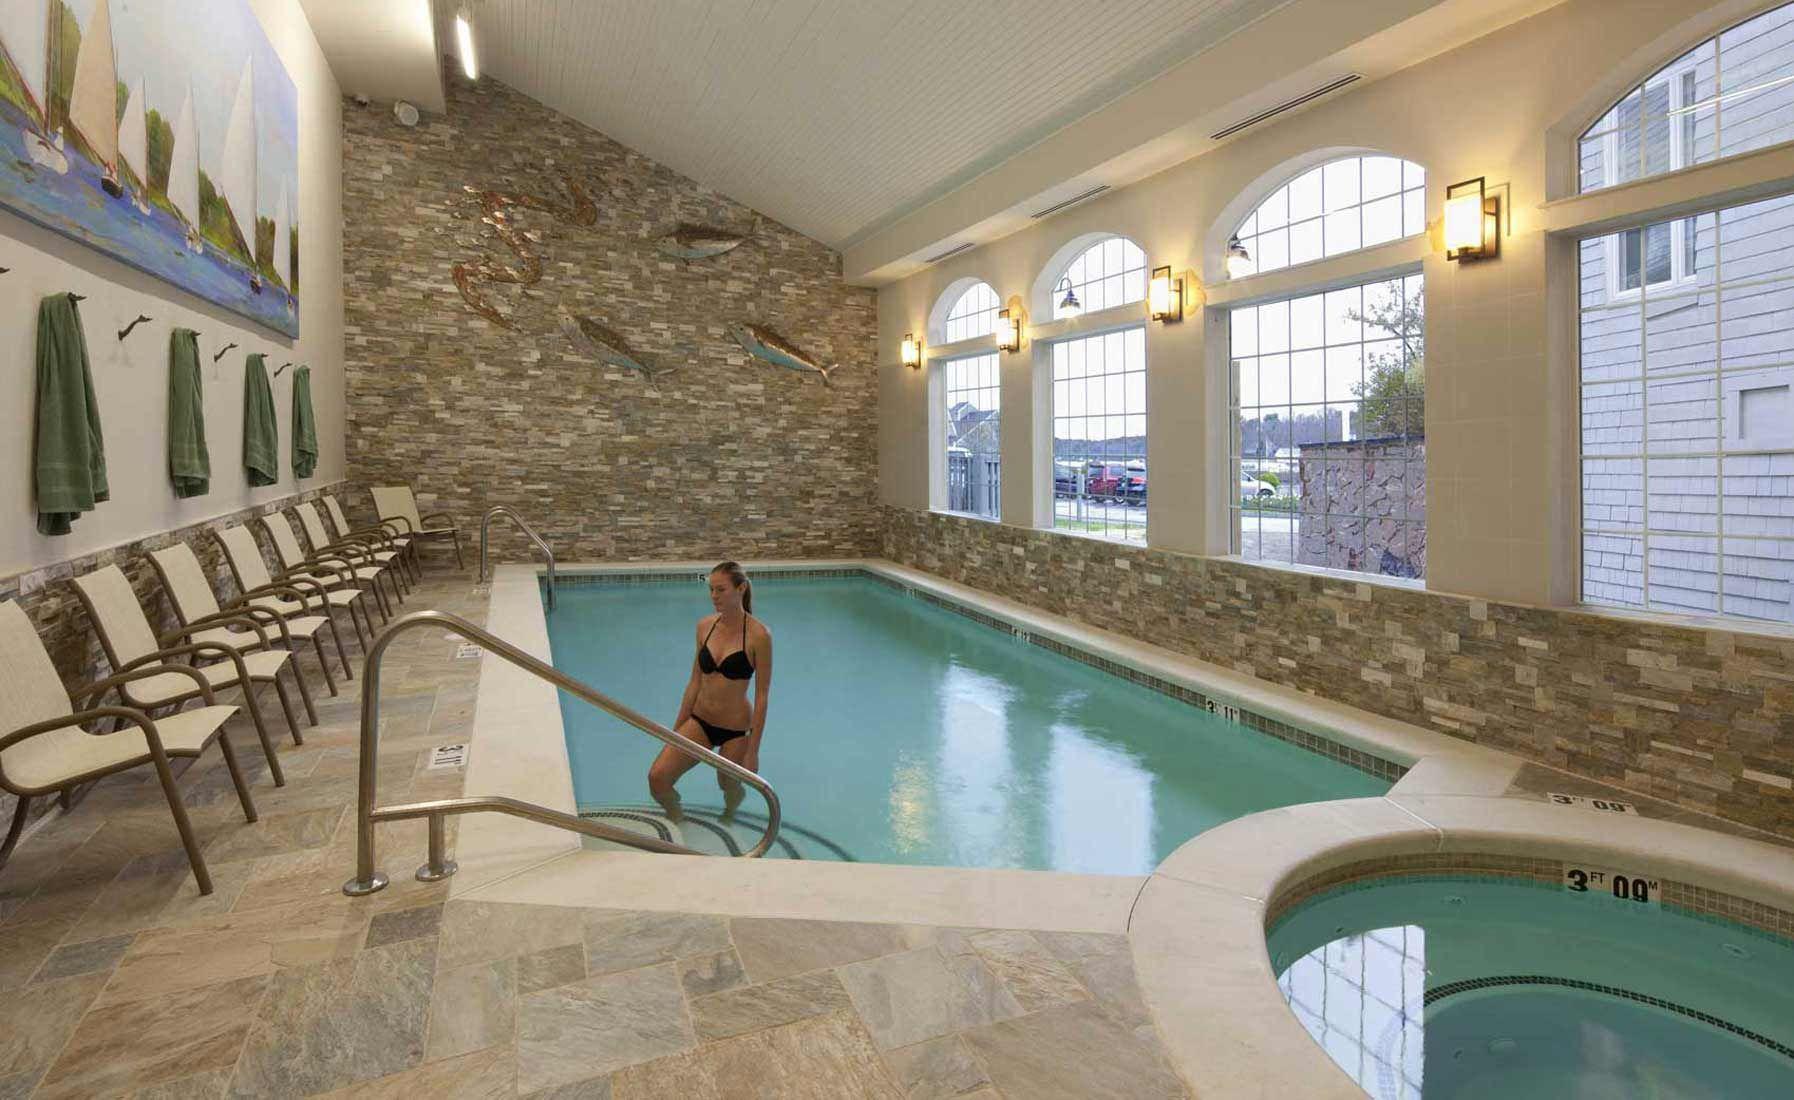 Residential indoor pool  Furniture. Residential Indoor Pool Designs ideas: Comfort Nuance ...